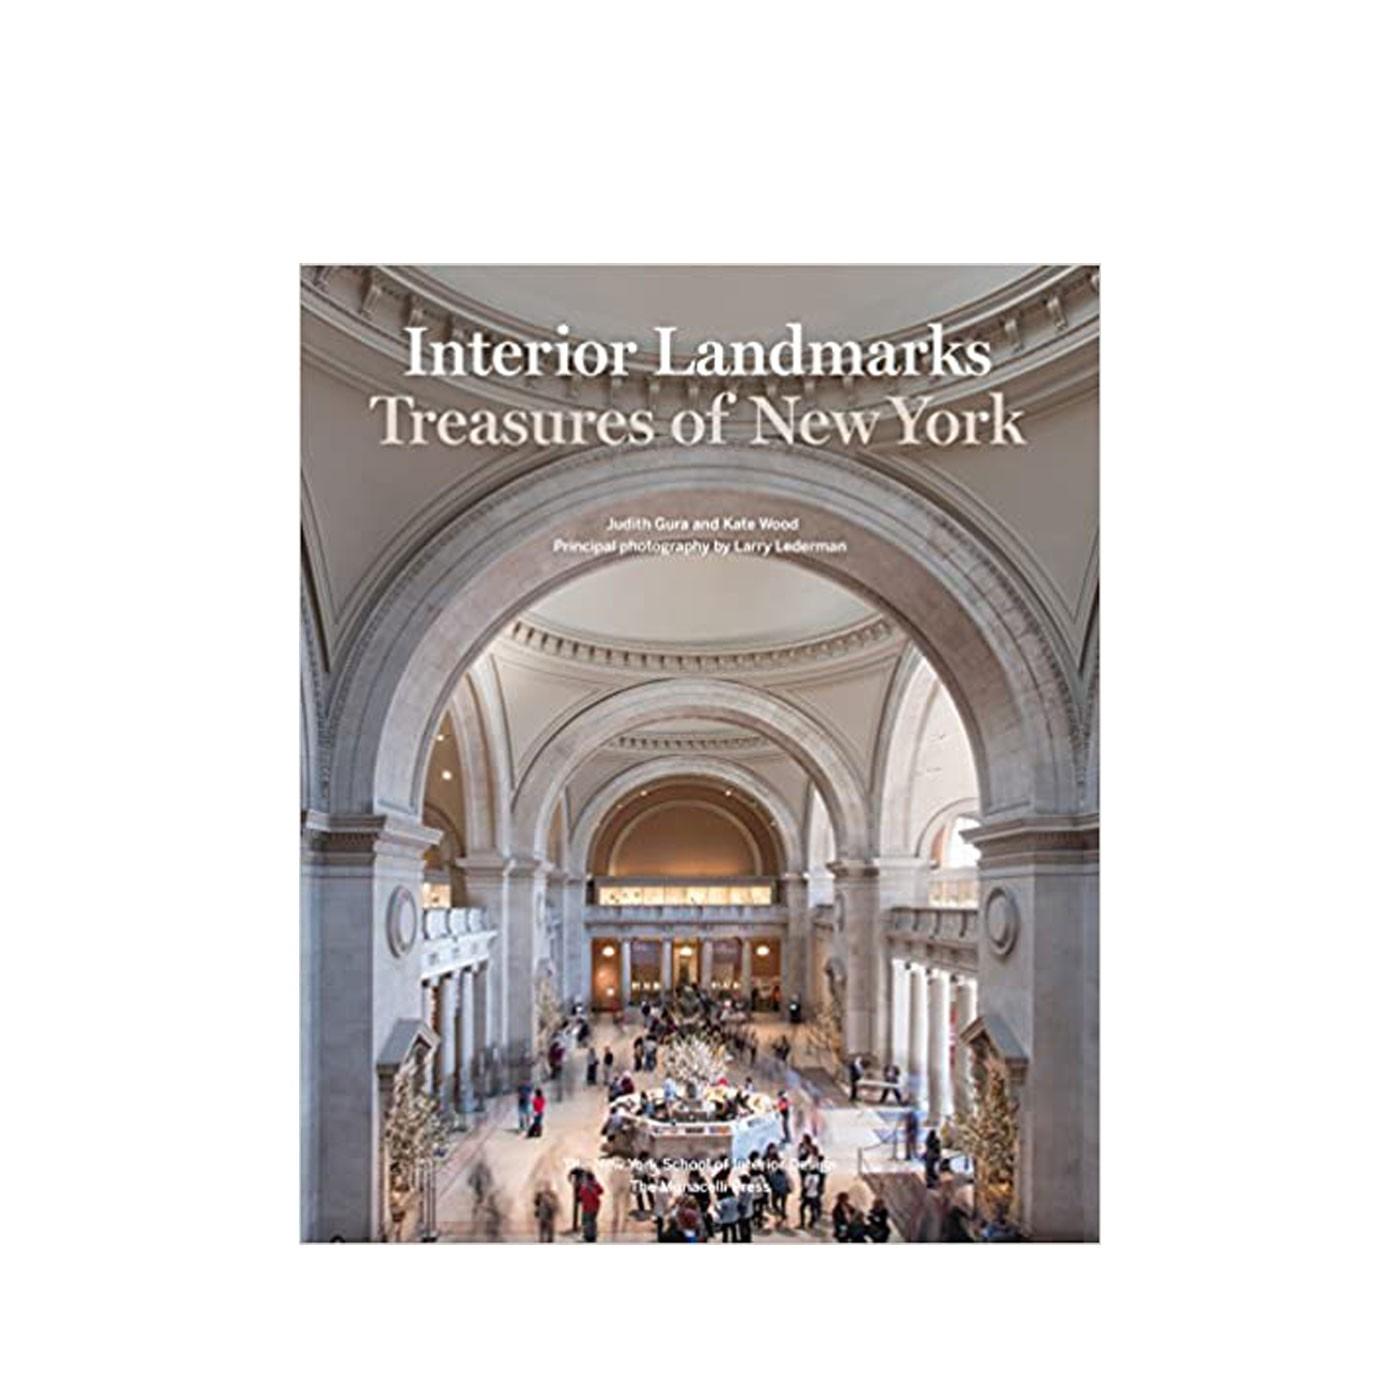 Interior Landmarks: Treasures